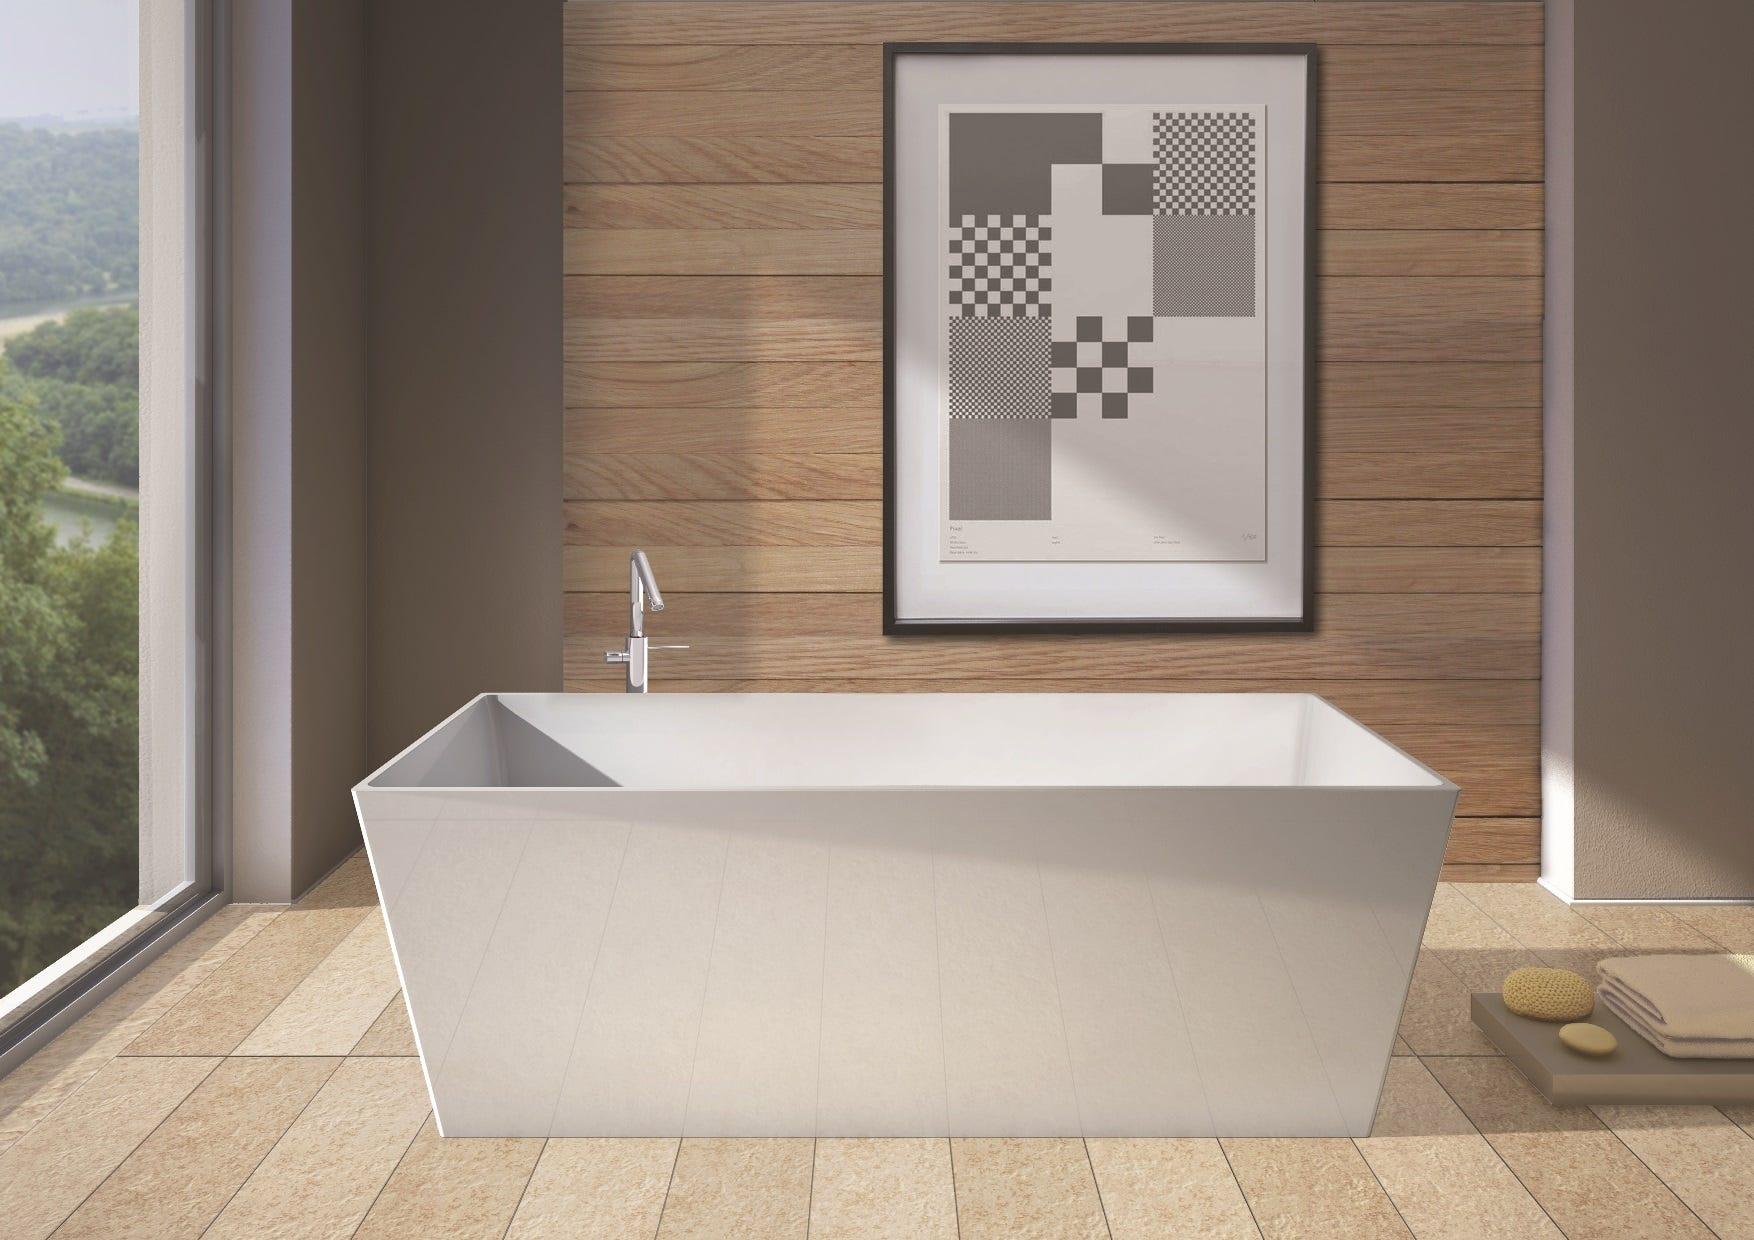 Vasca da bagno da design moderno quadra modello york in - Bagno design moderno ...